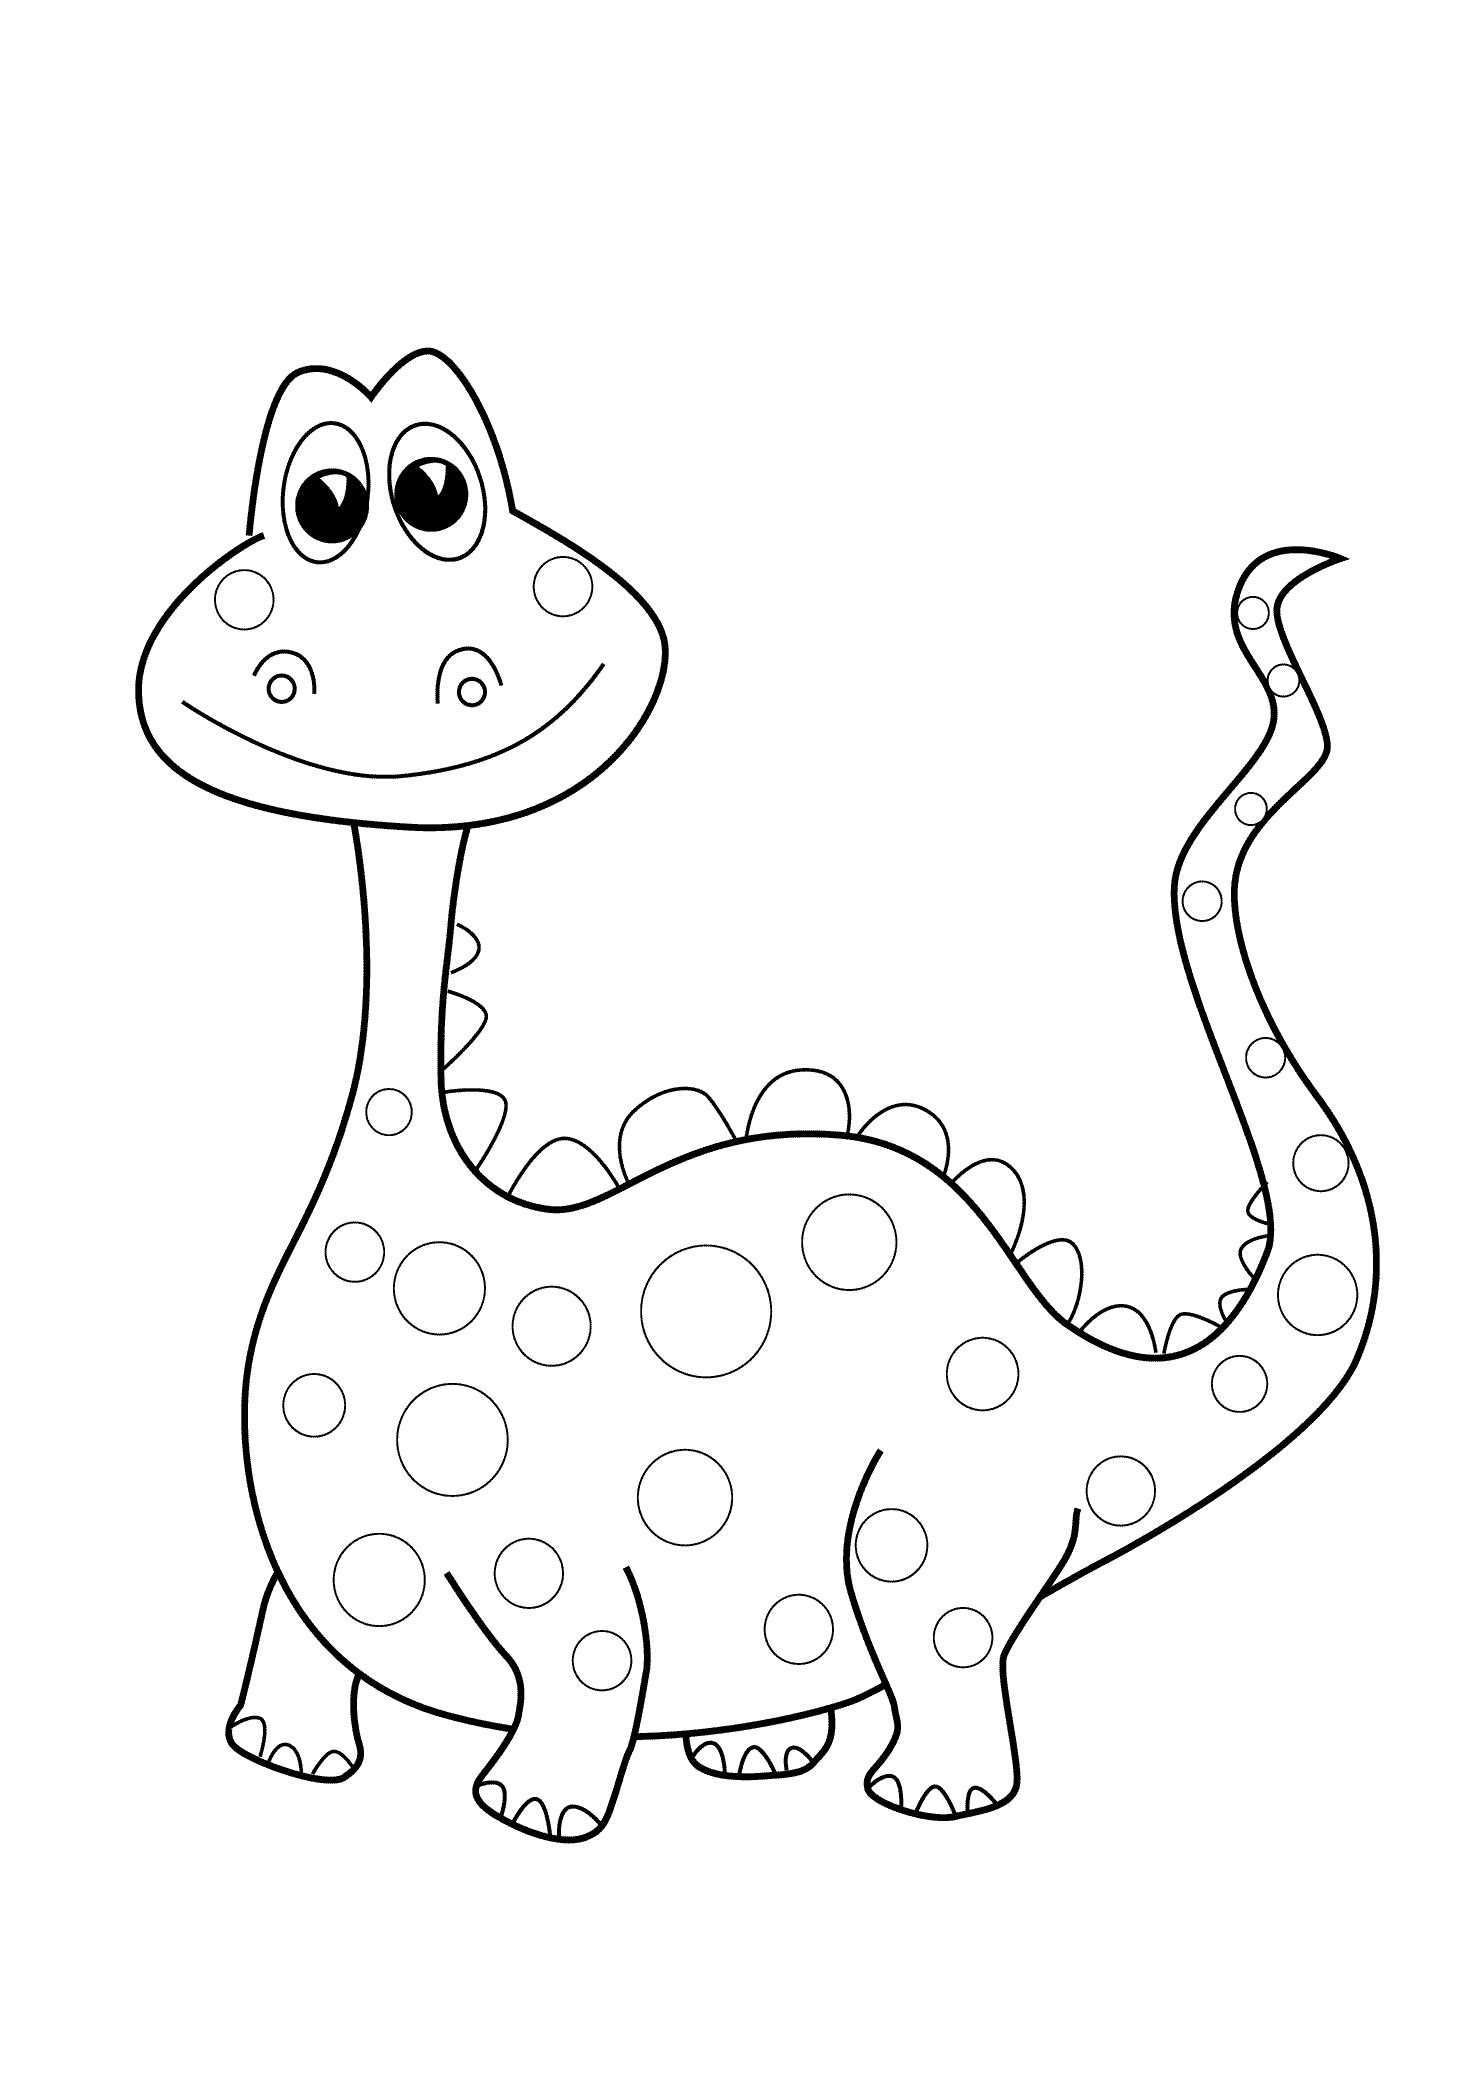 1483x2079 Preschool Dinosaur Coloring Pages Printable